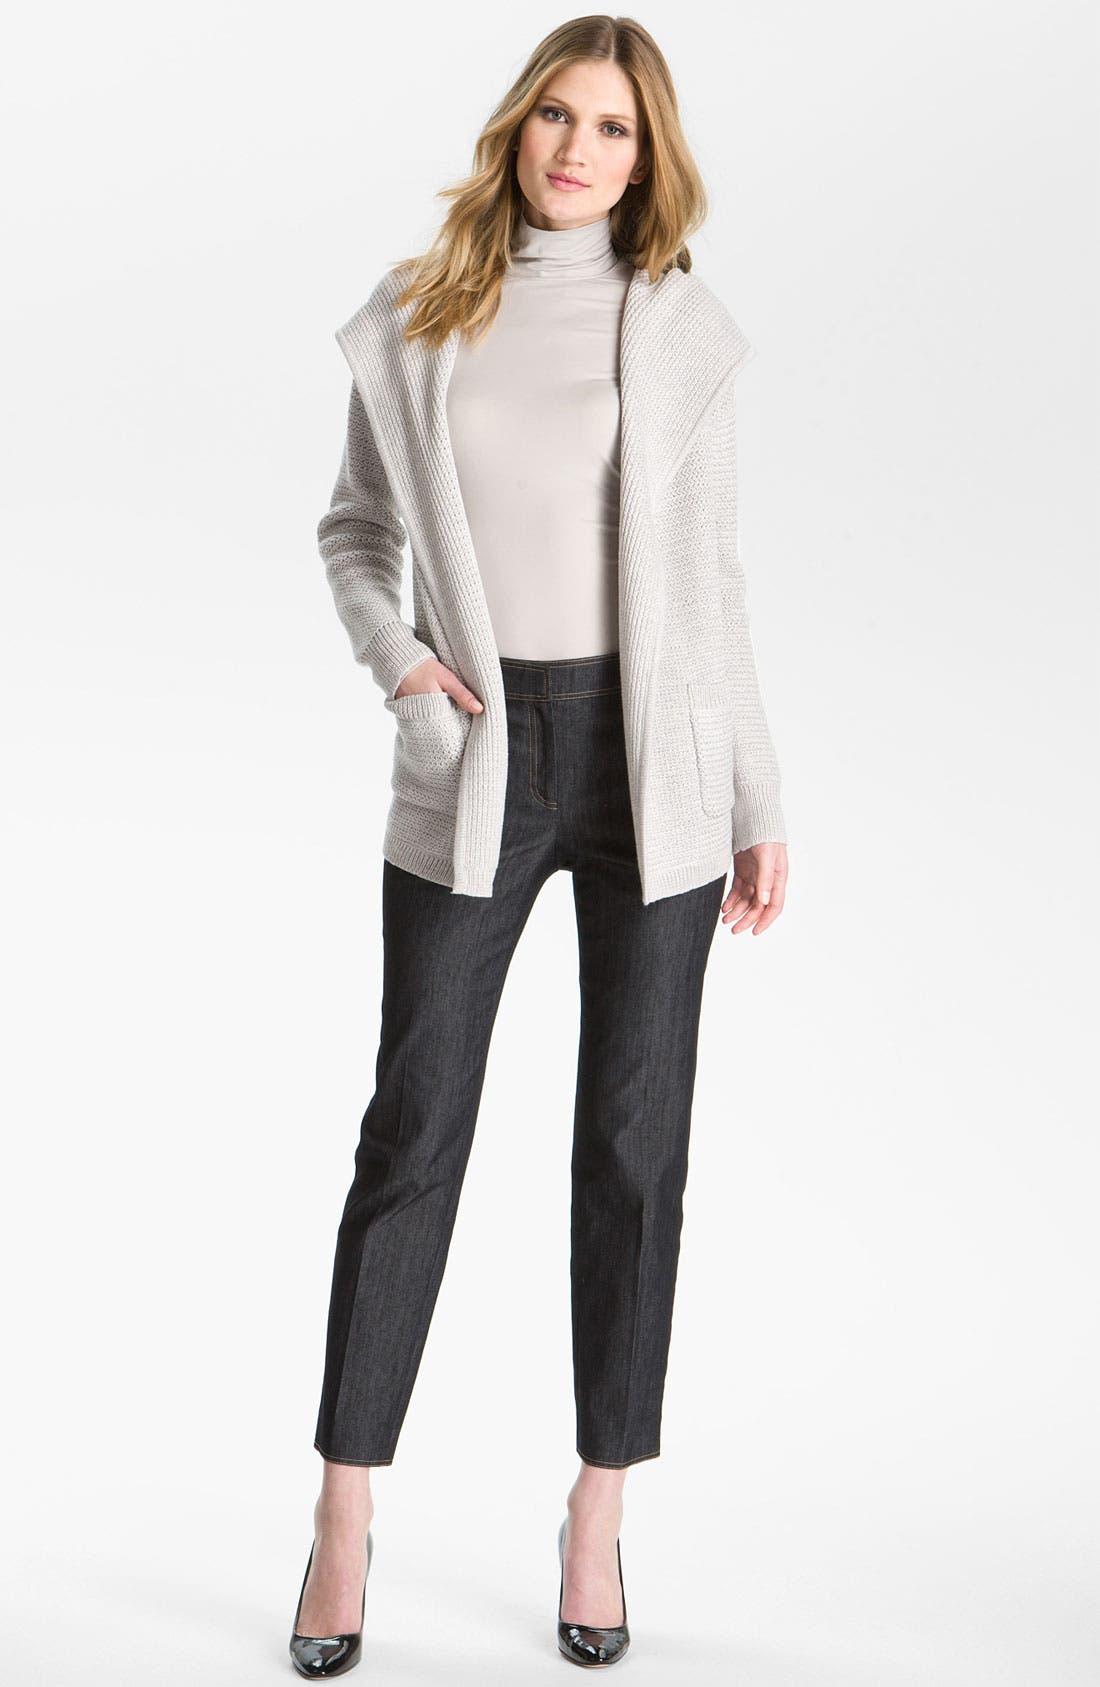 Main Image - St. John Yellow Label Hooded Sweater Jacket